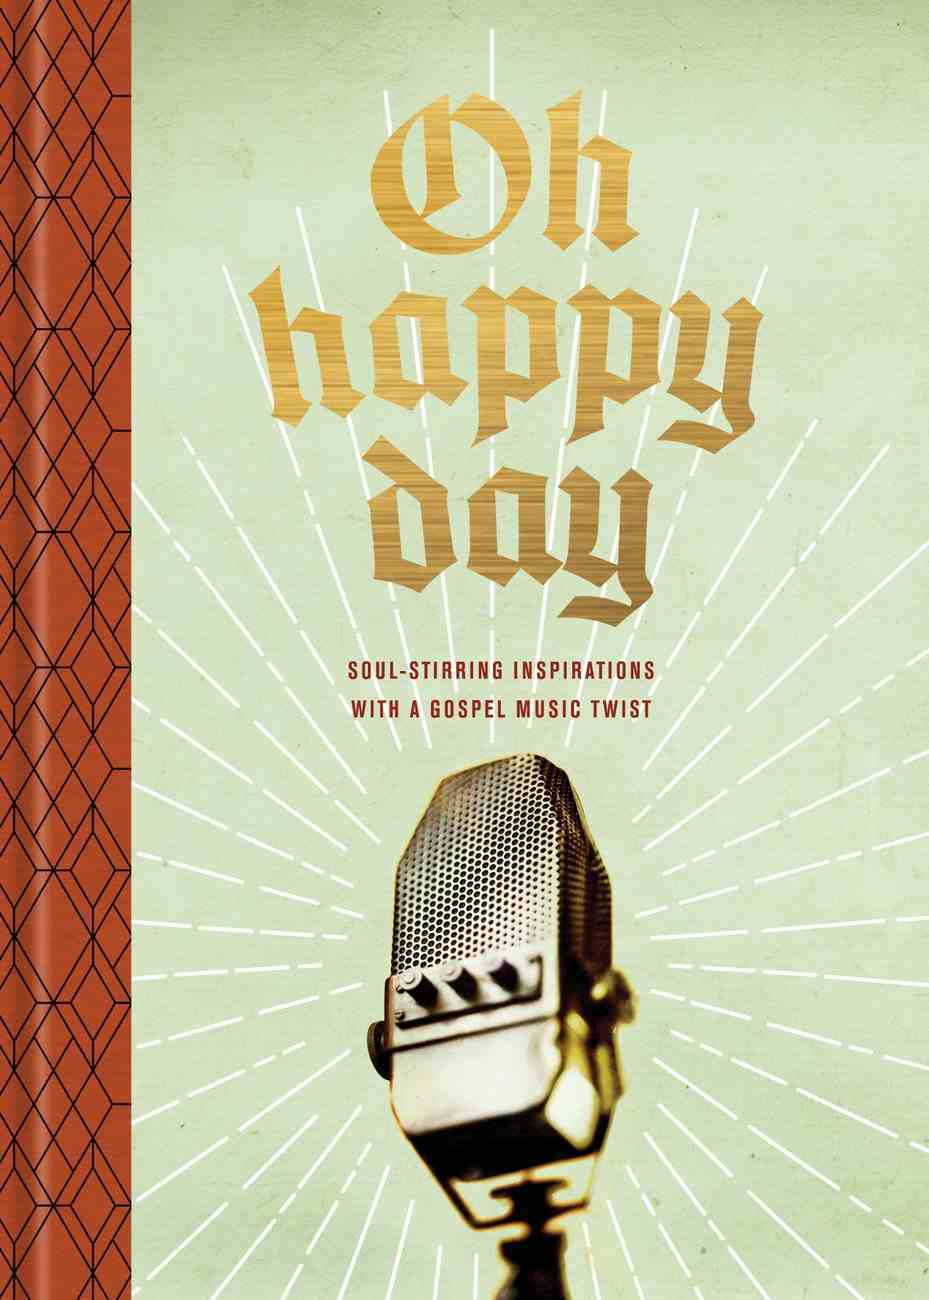 Oh Happy Day: Soul-Stirring Inspirations With a Gospel Music Twist Hardback